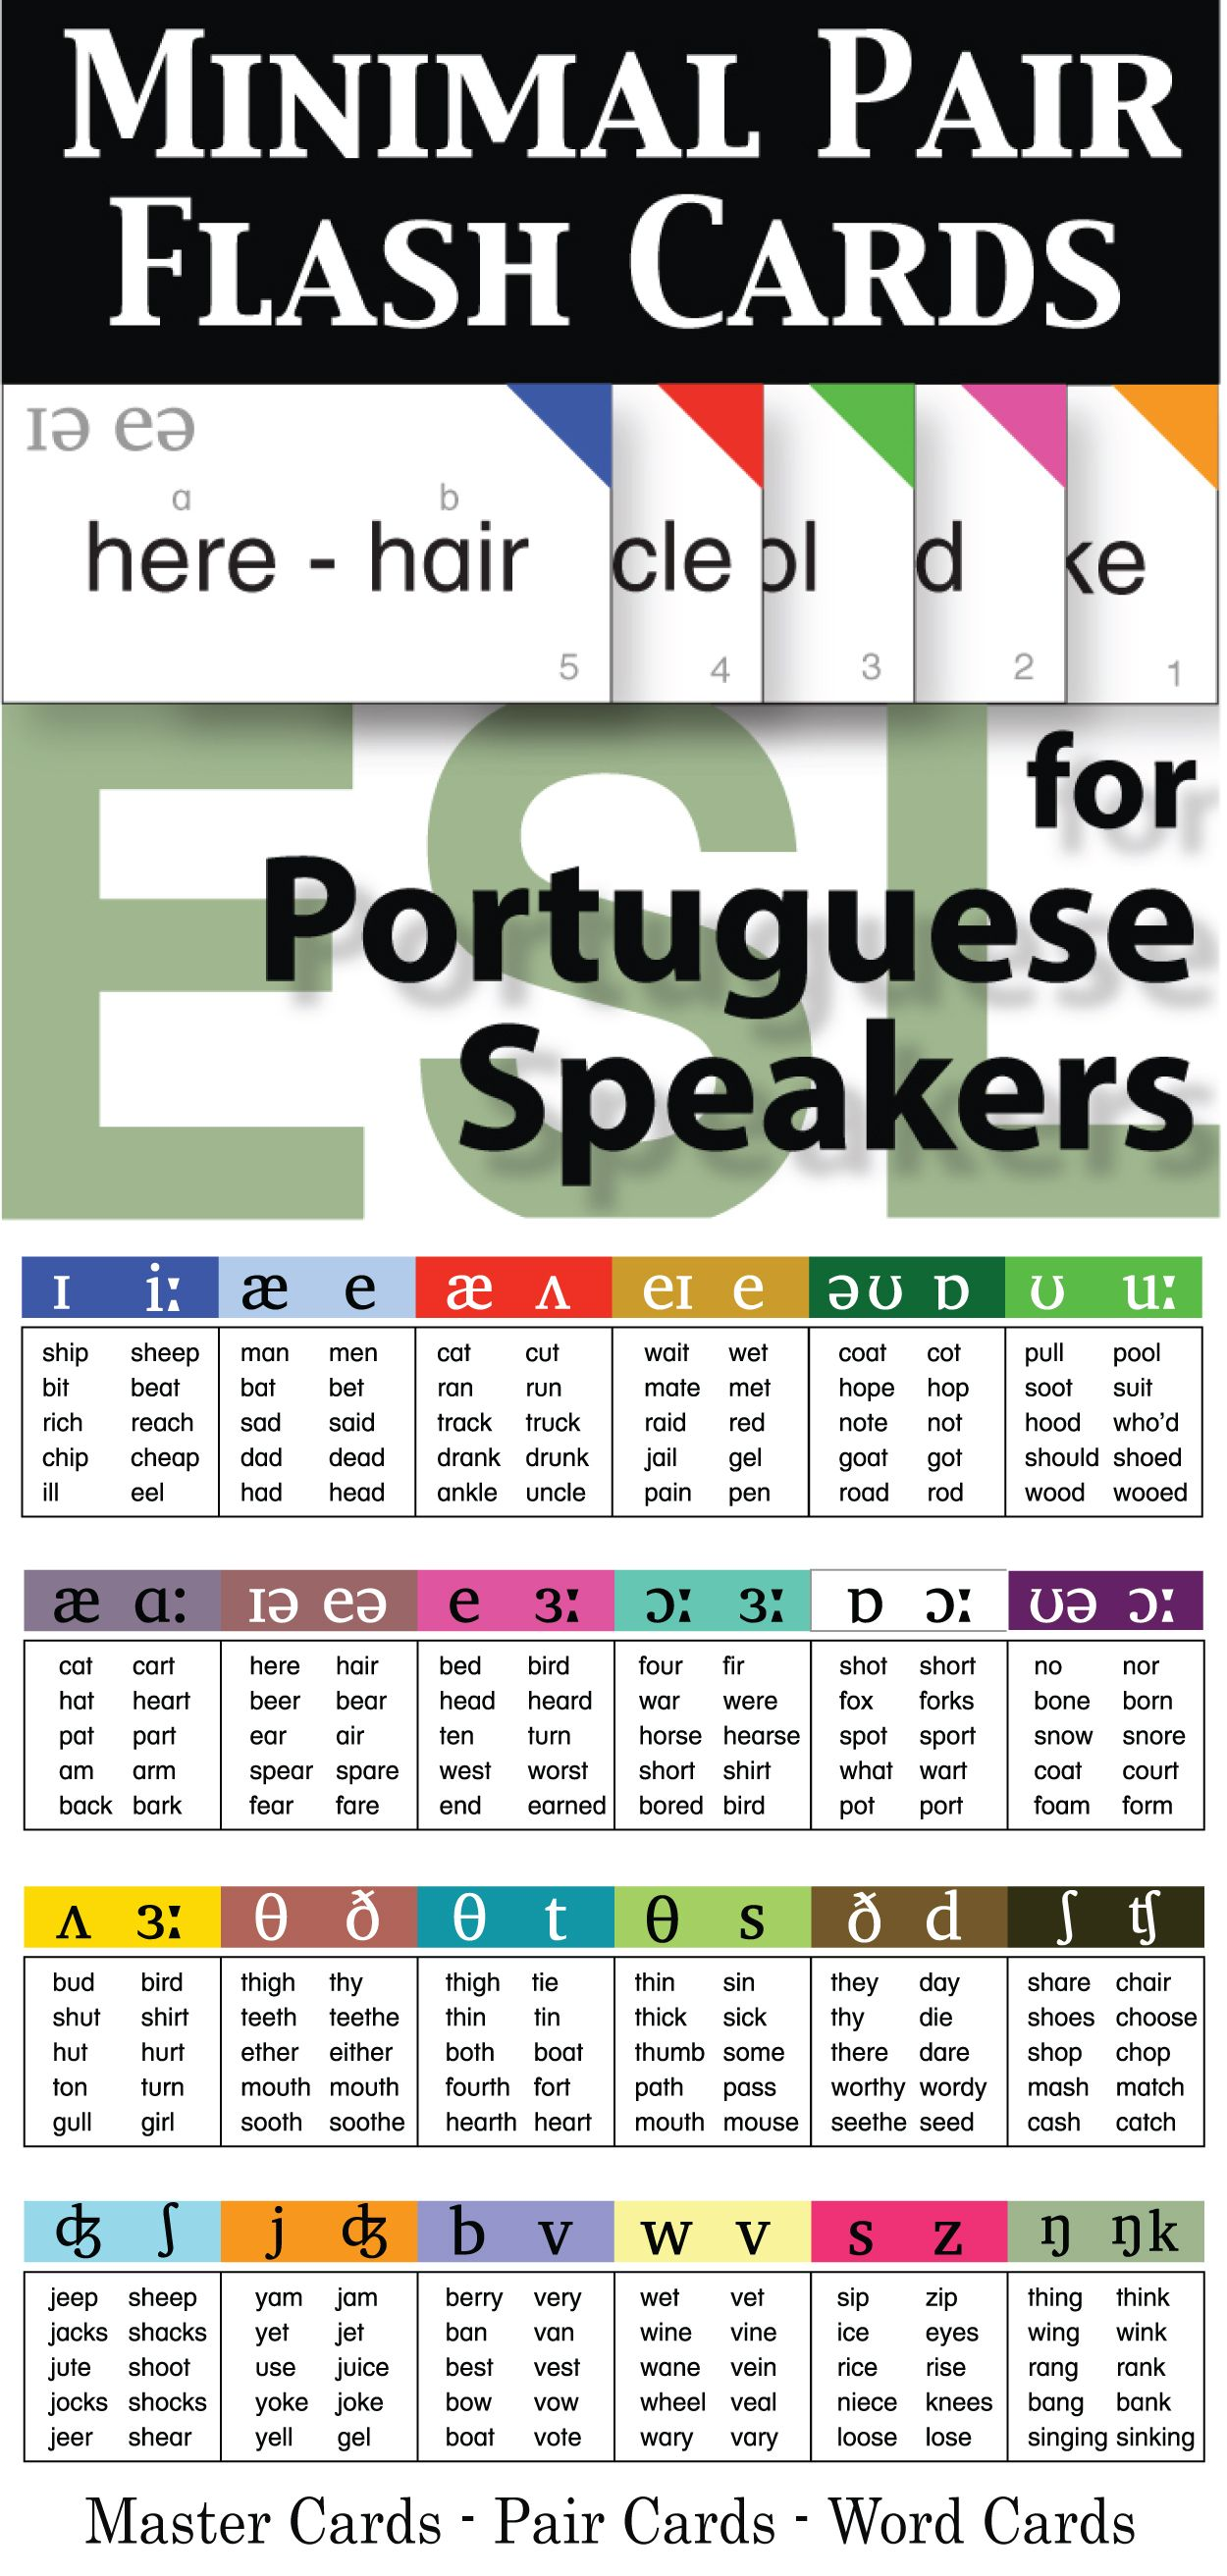 Minimal Pair Flash Card For Portuguese Speakers In